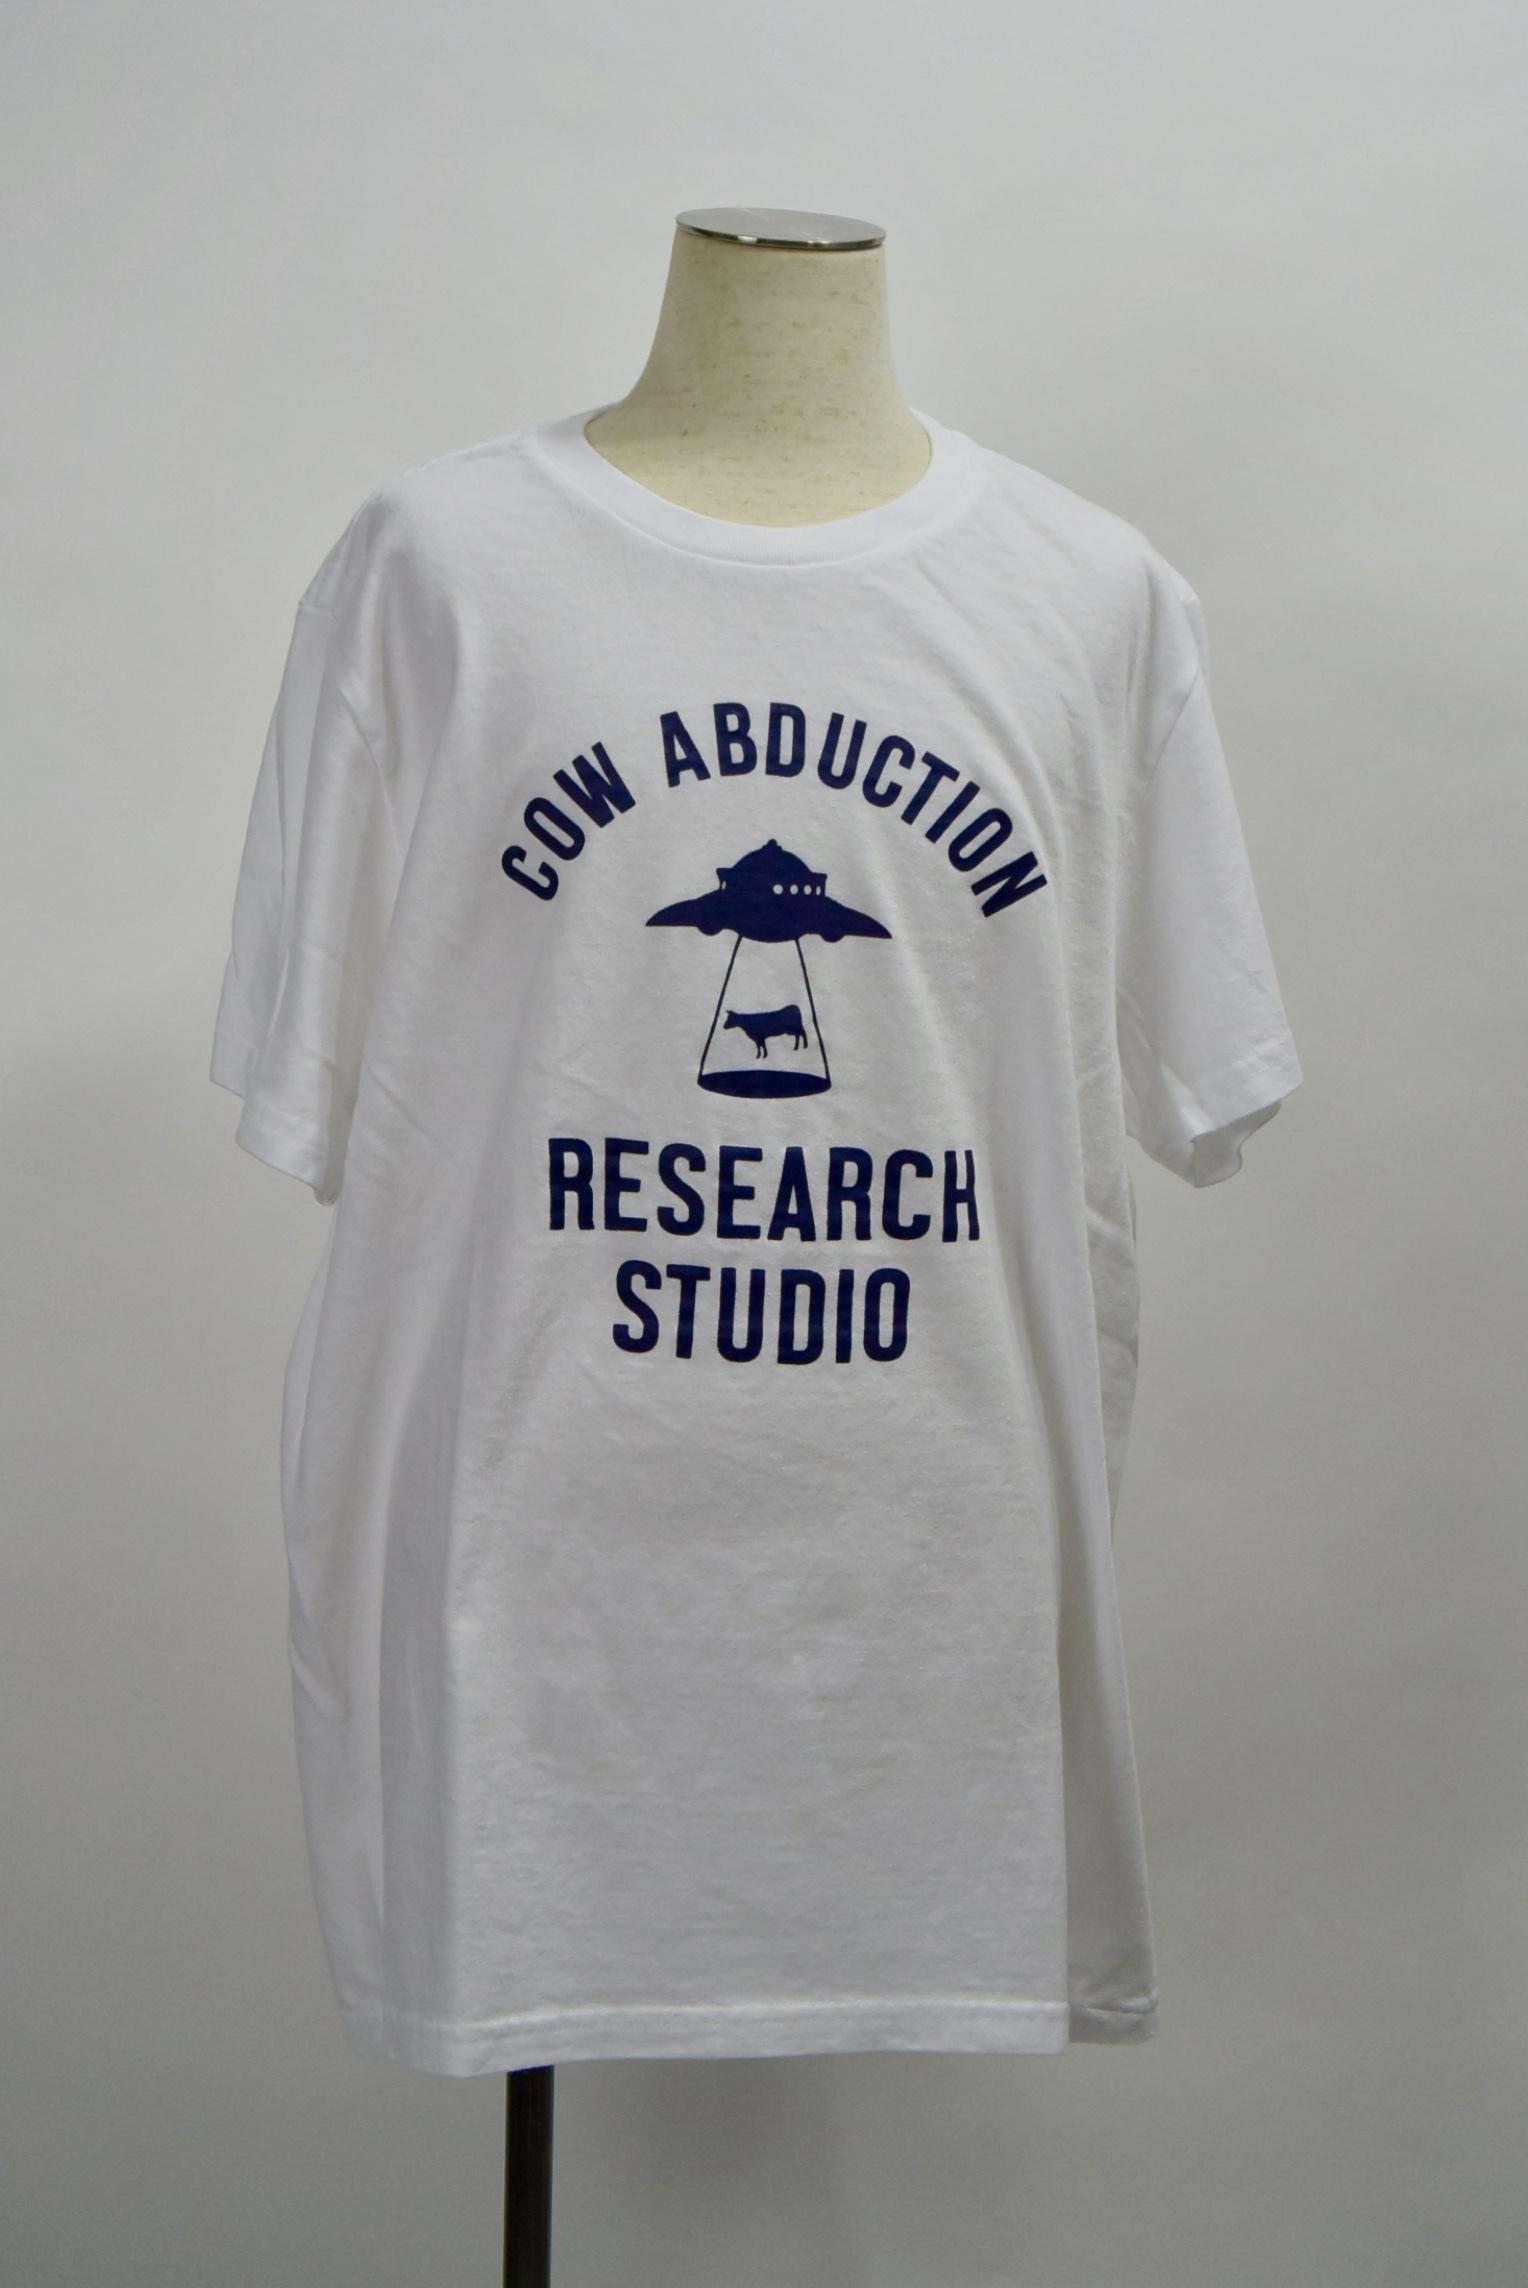 TACOMA FUJI RECORDS COW ABDUCTION designed by Jerry UKAI WHITE